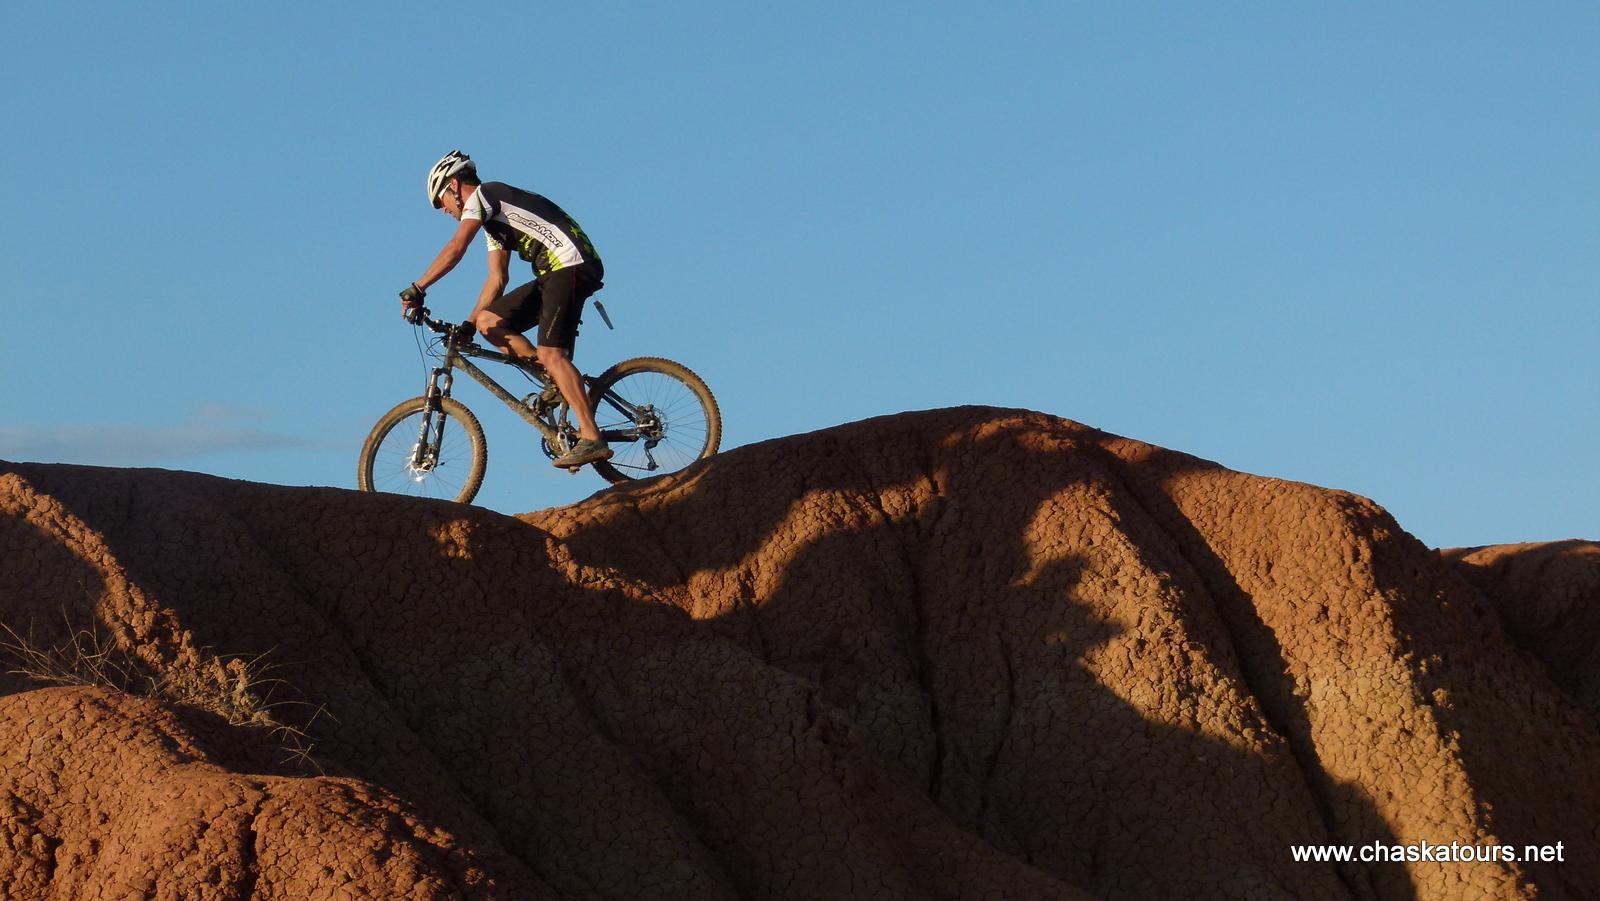 Ciclismo-2012-9-1.jpg